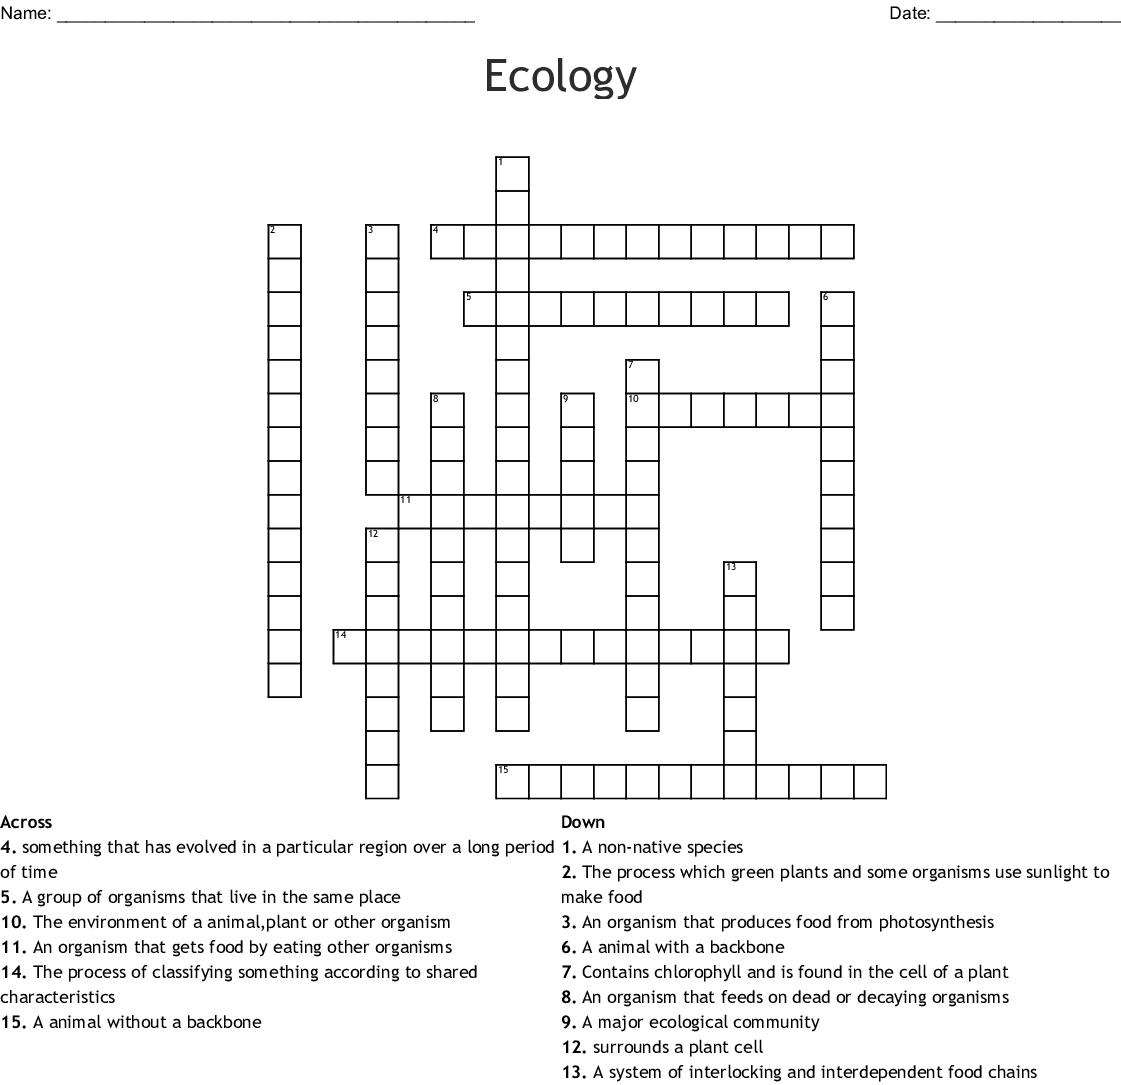 Environment Key Words Crossword